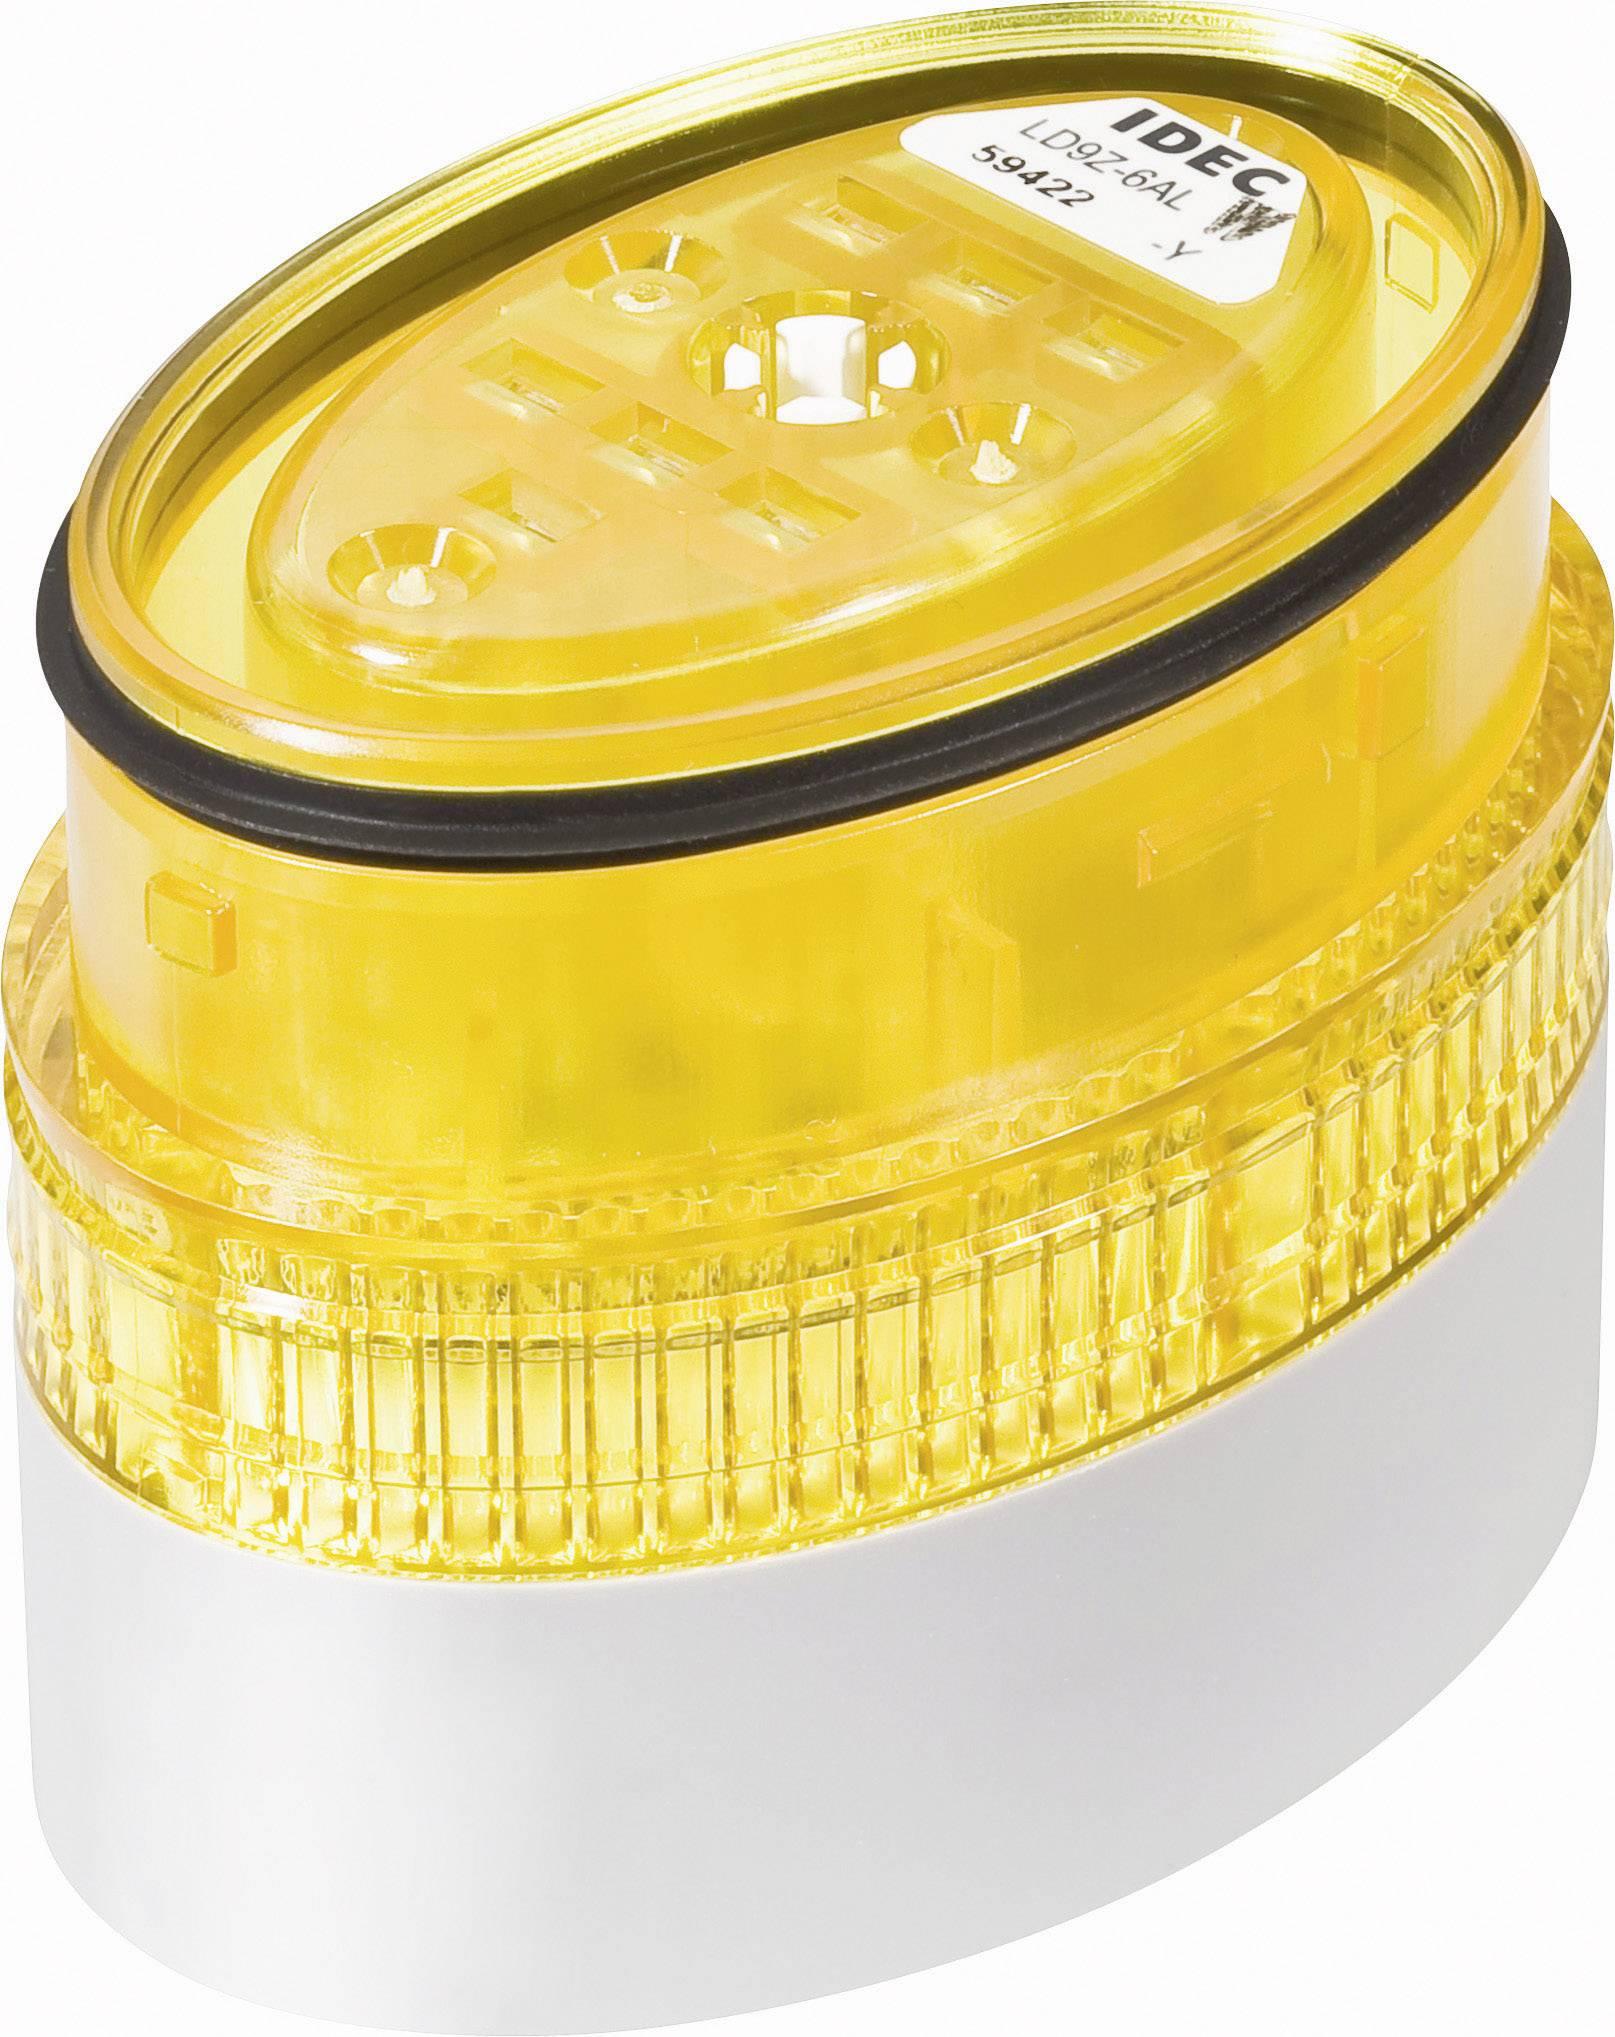 LED signalizace Idec LD6A (LD9Z-6ALW-Y), IP65, Ø 40 x 60 mm, žlutá